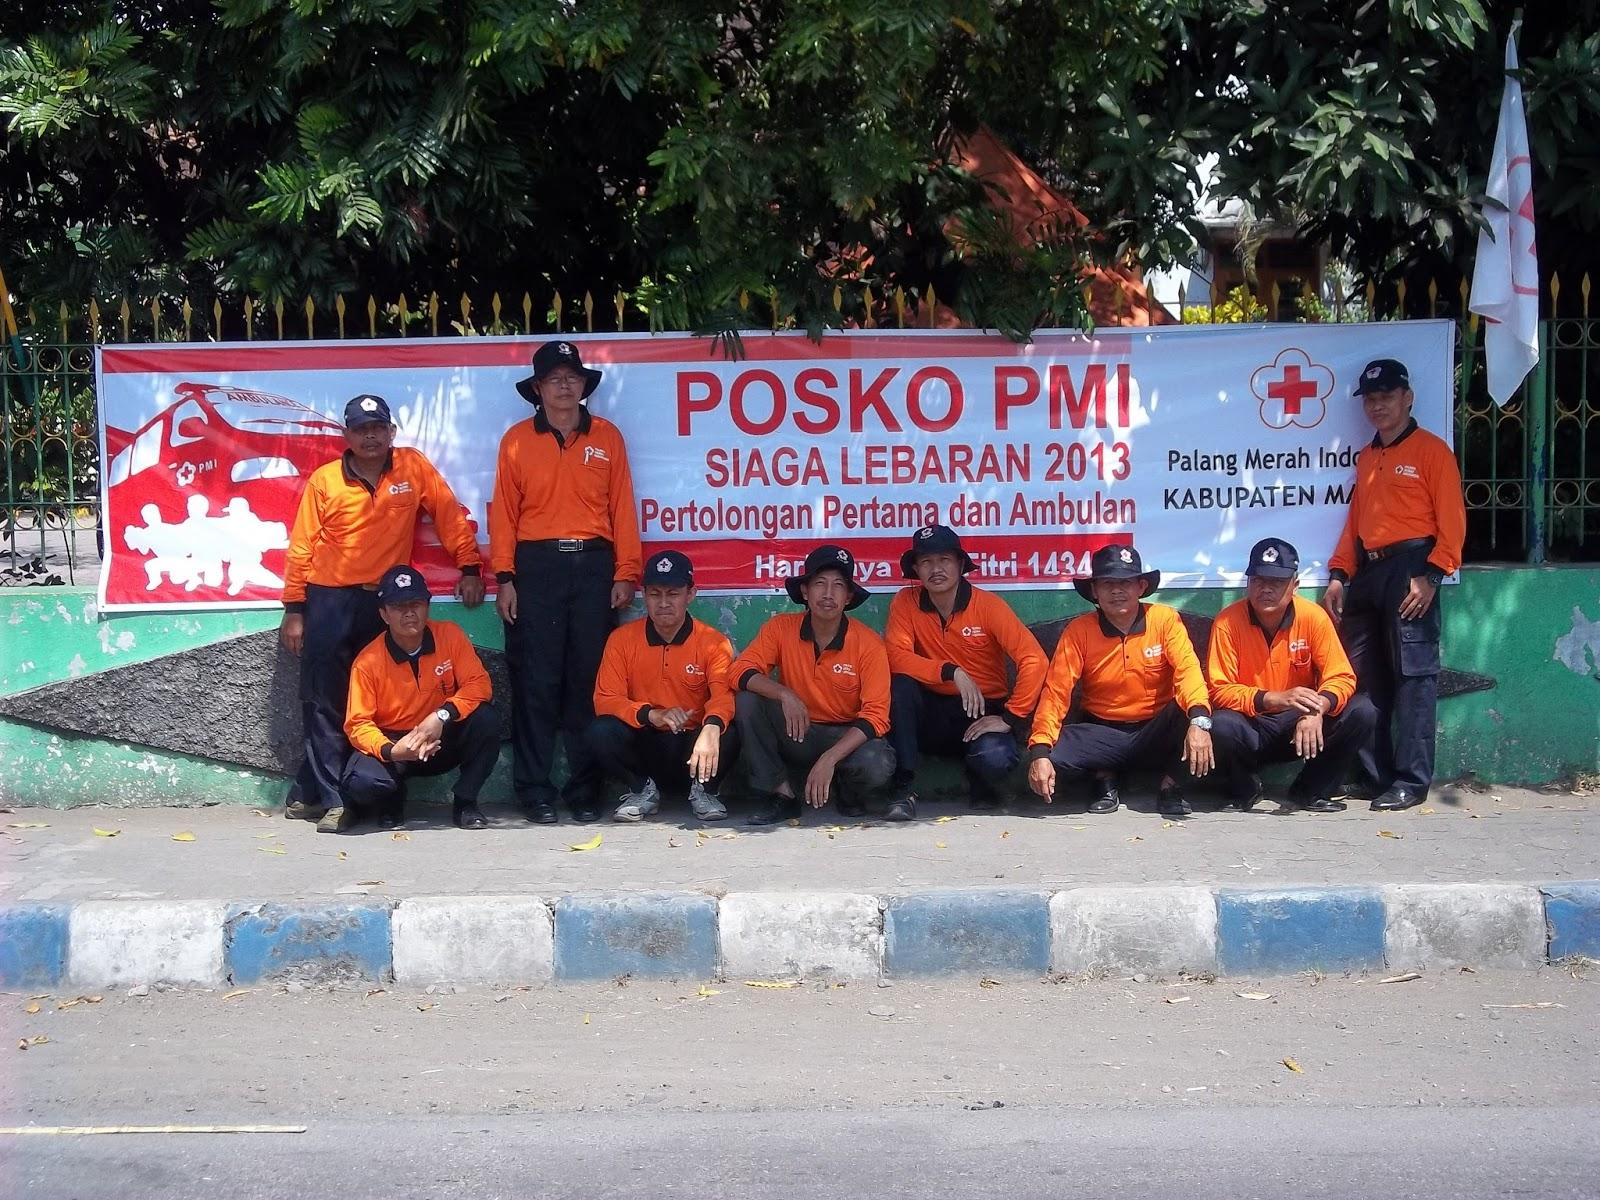 Palang Merah Indonesia Kabupaten Madiun Posko Siaga Lebaran 2013 Rangka